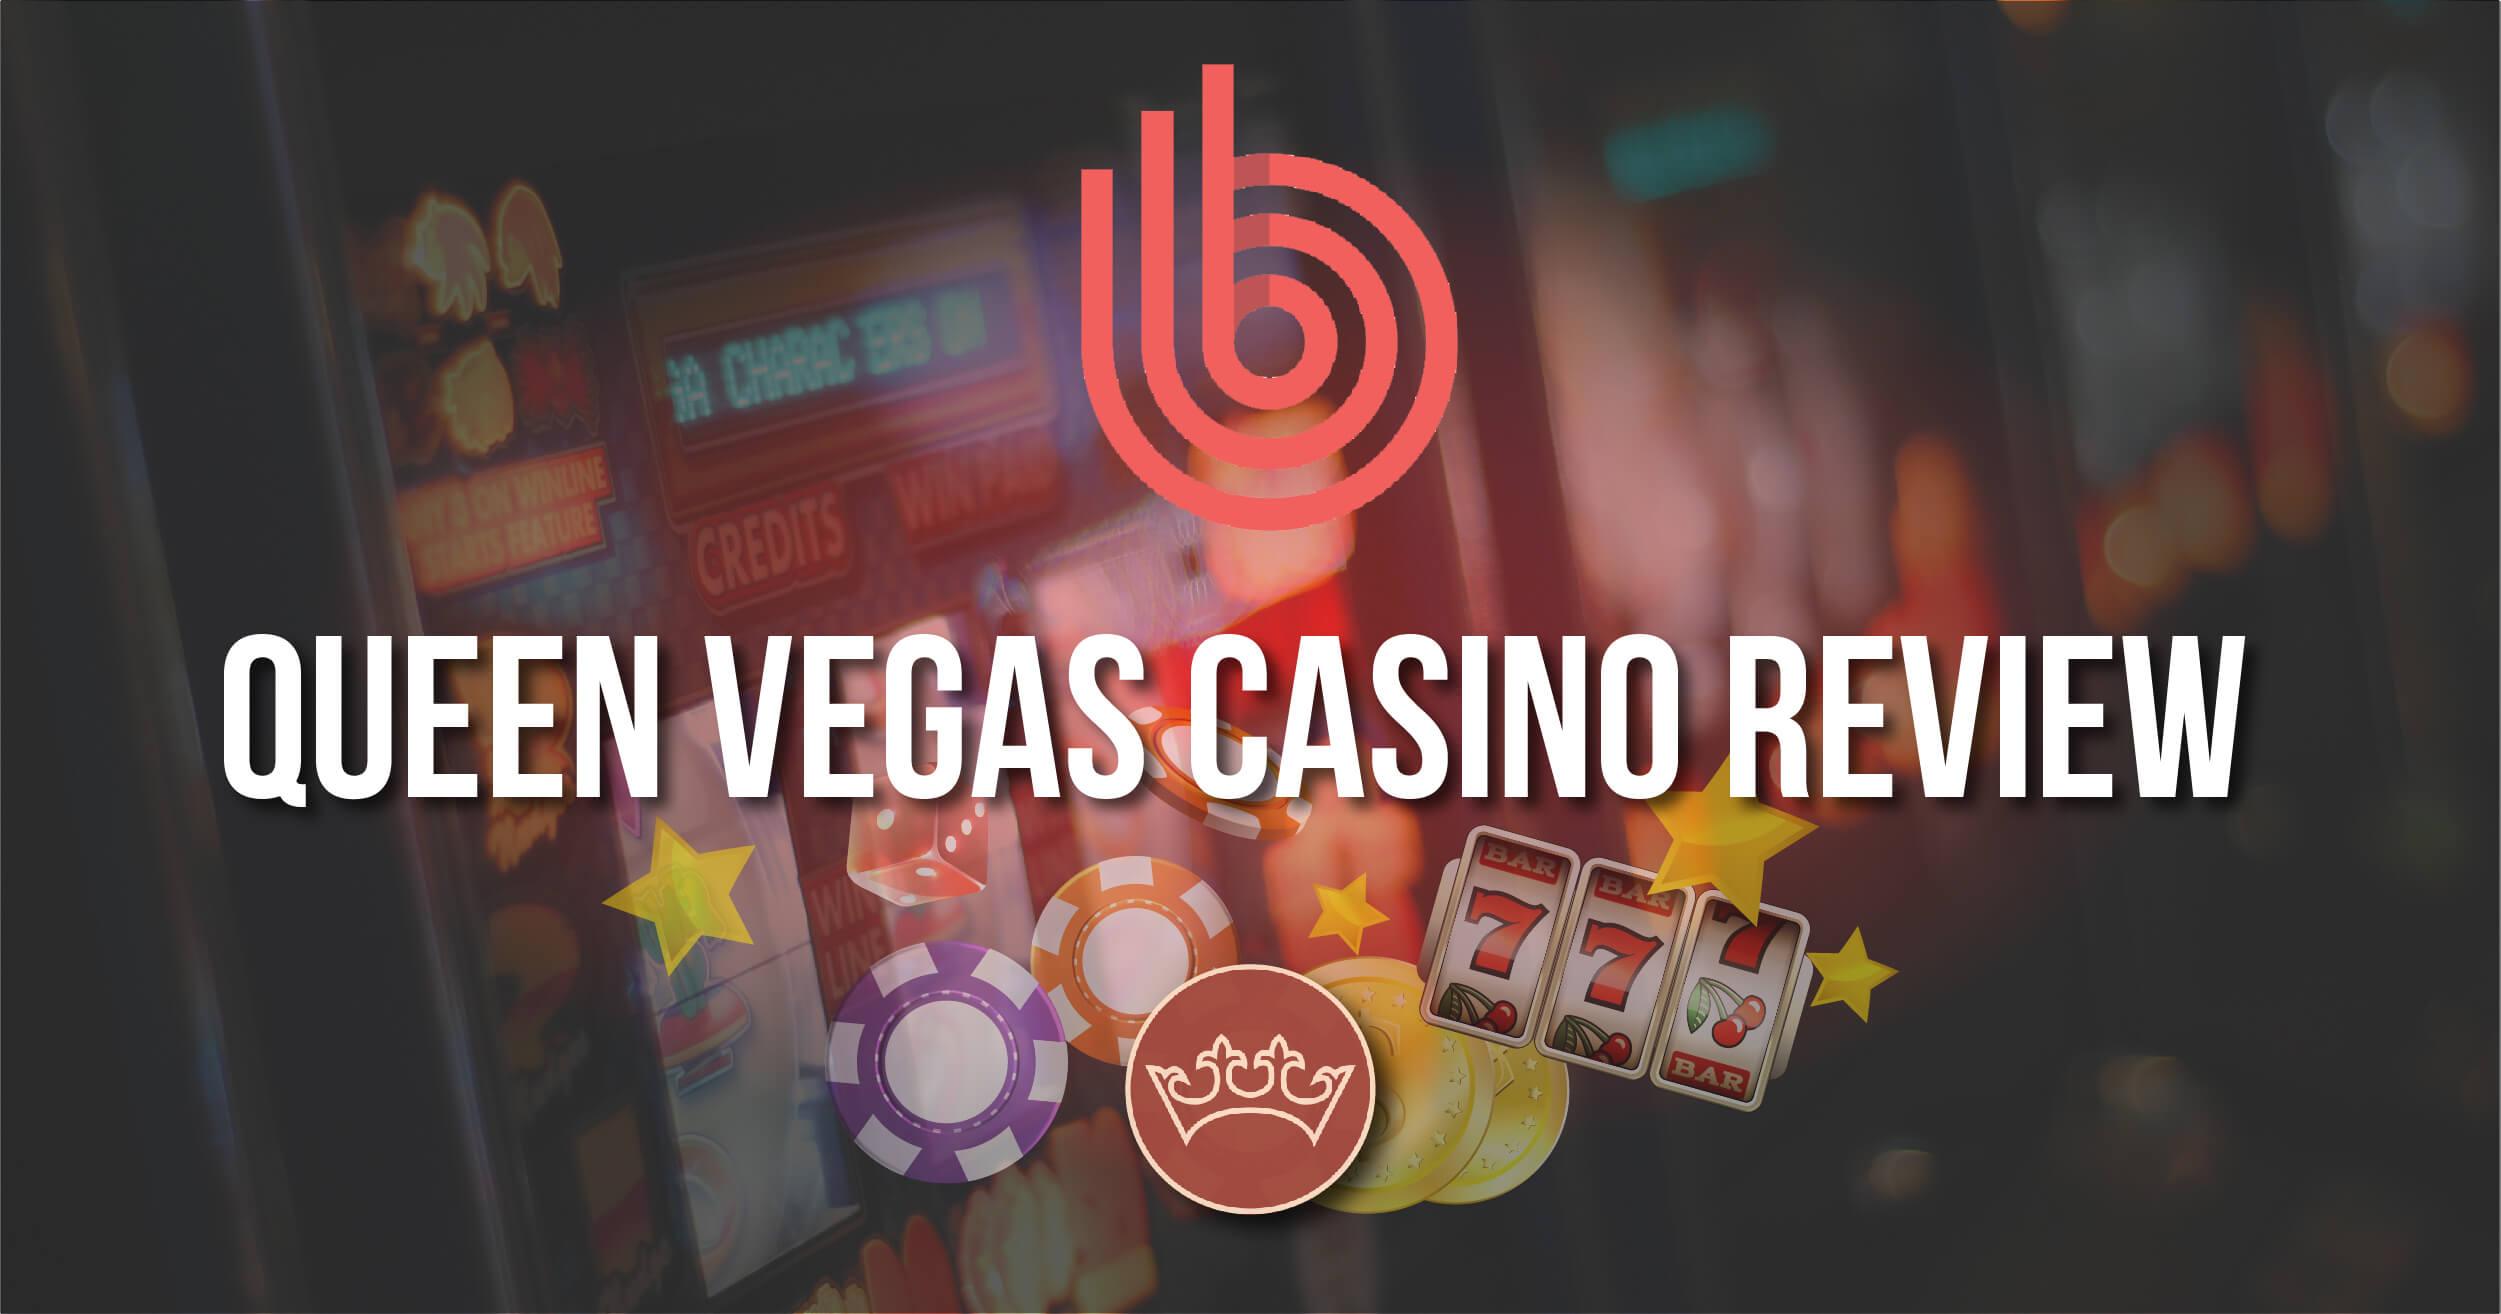 Queen Vegas Casino Review